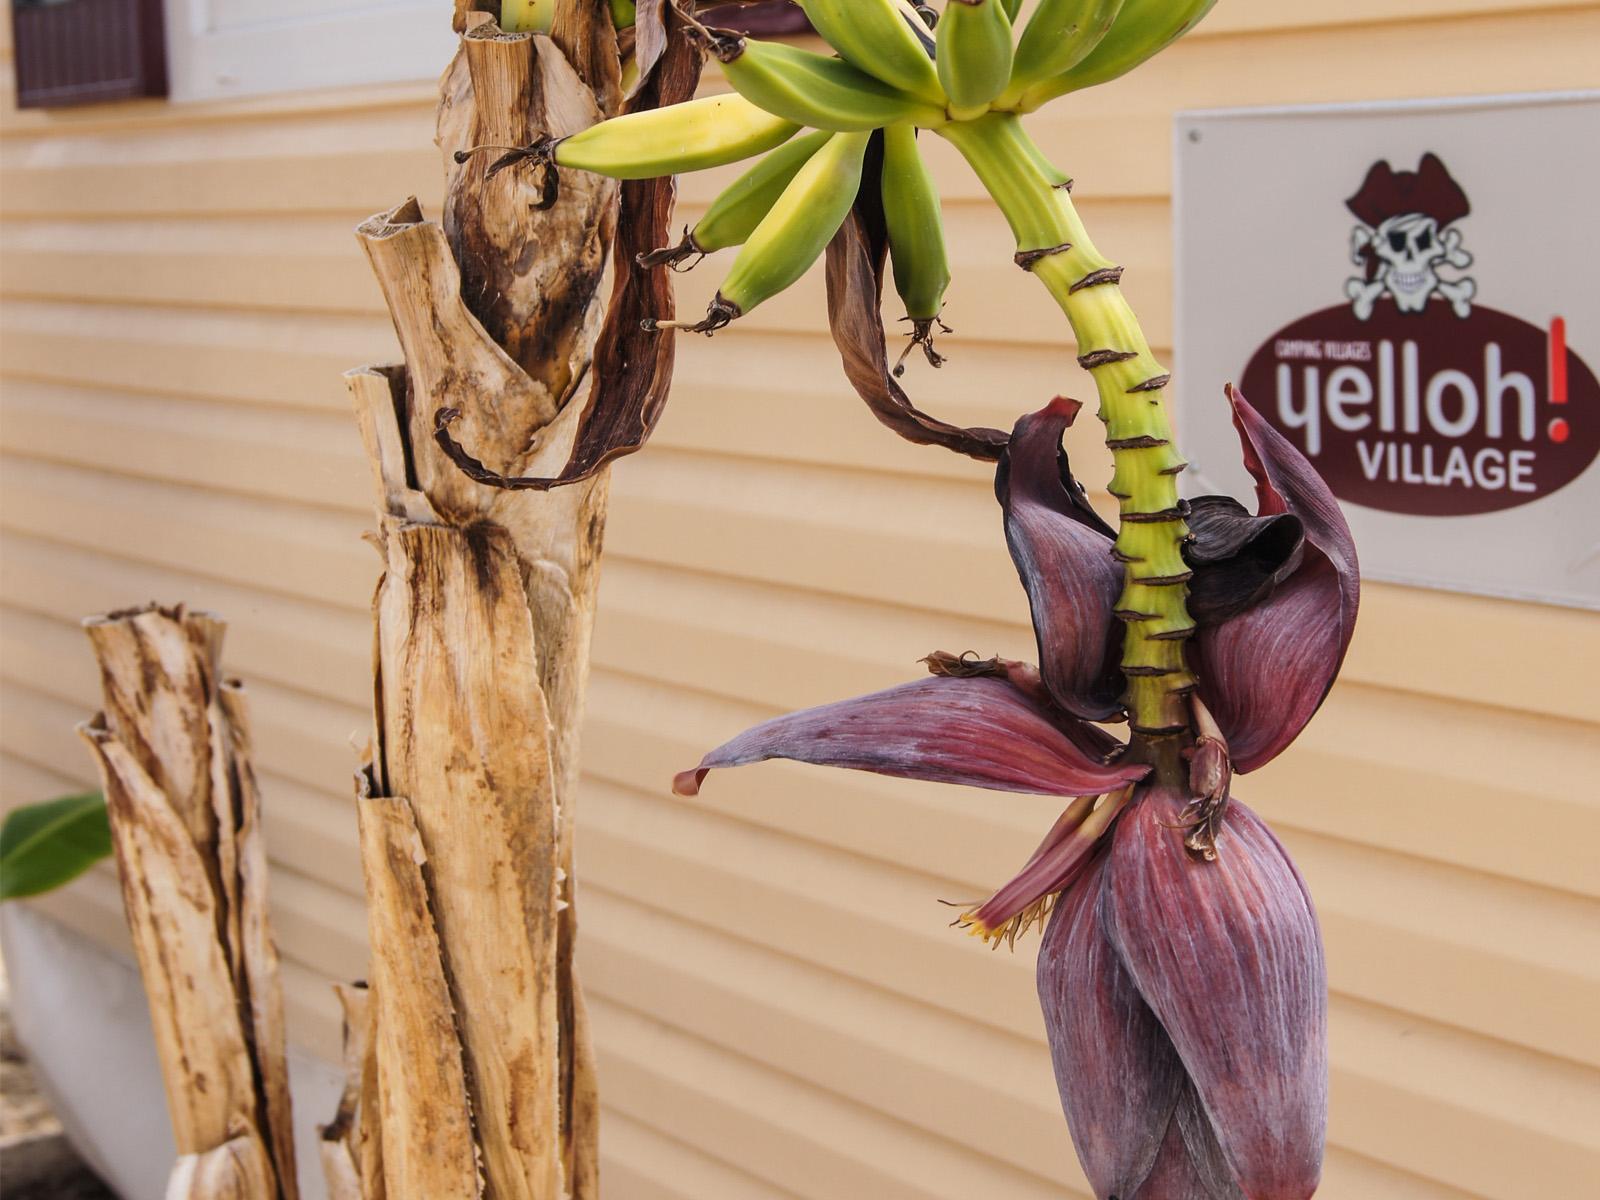 végétation bananier